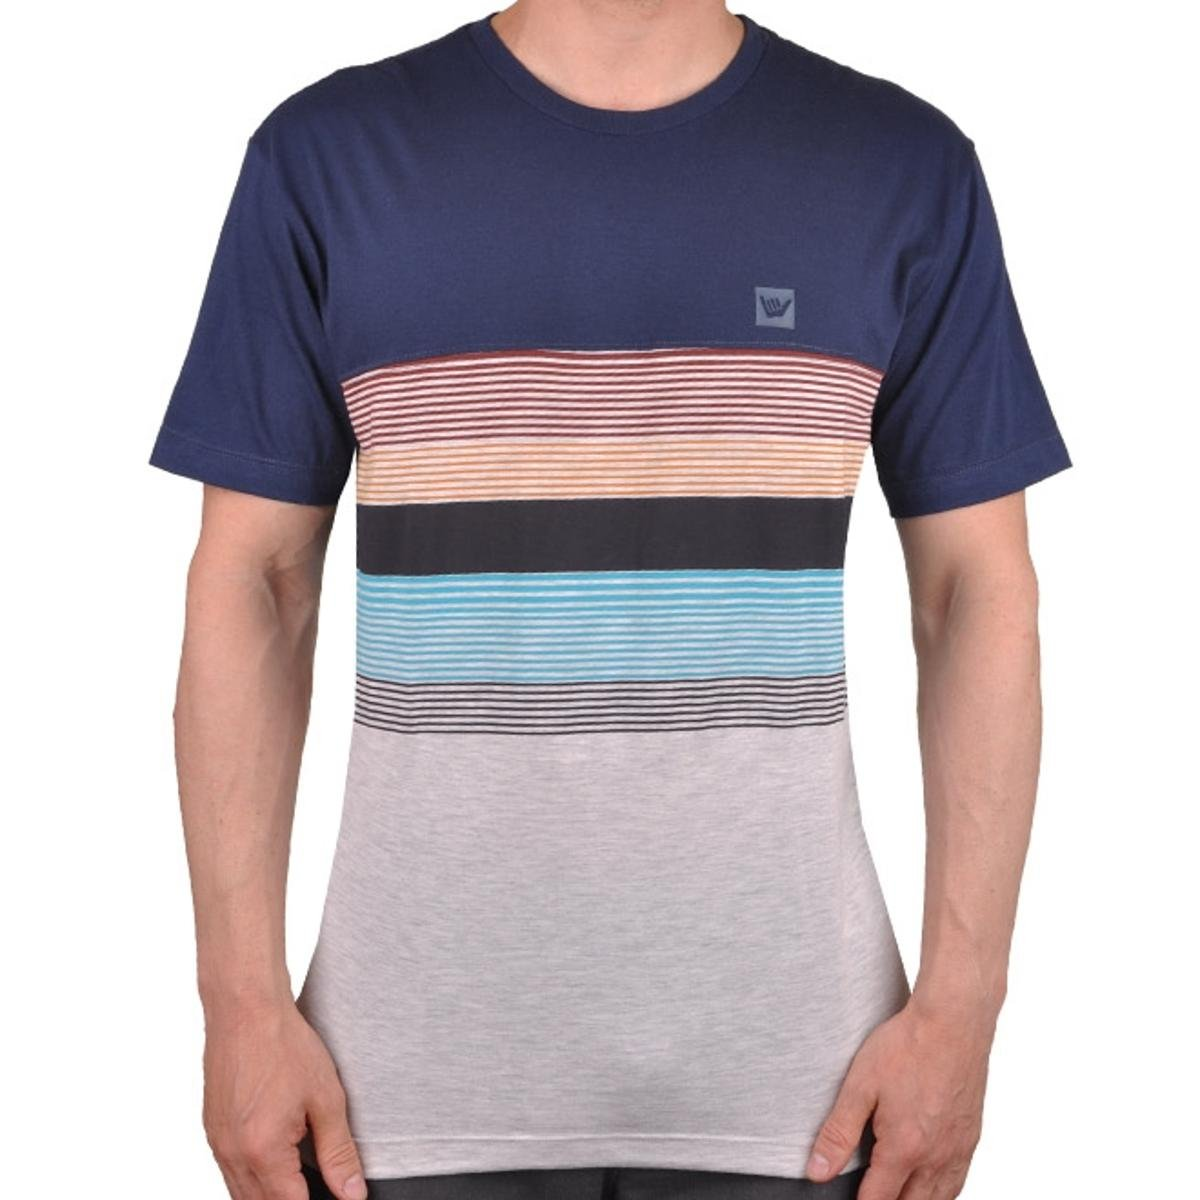 Camiseta Hang Loose Sunset Masculina - Compre Agora  4ddd21b64ce64